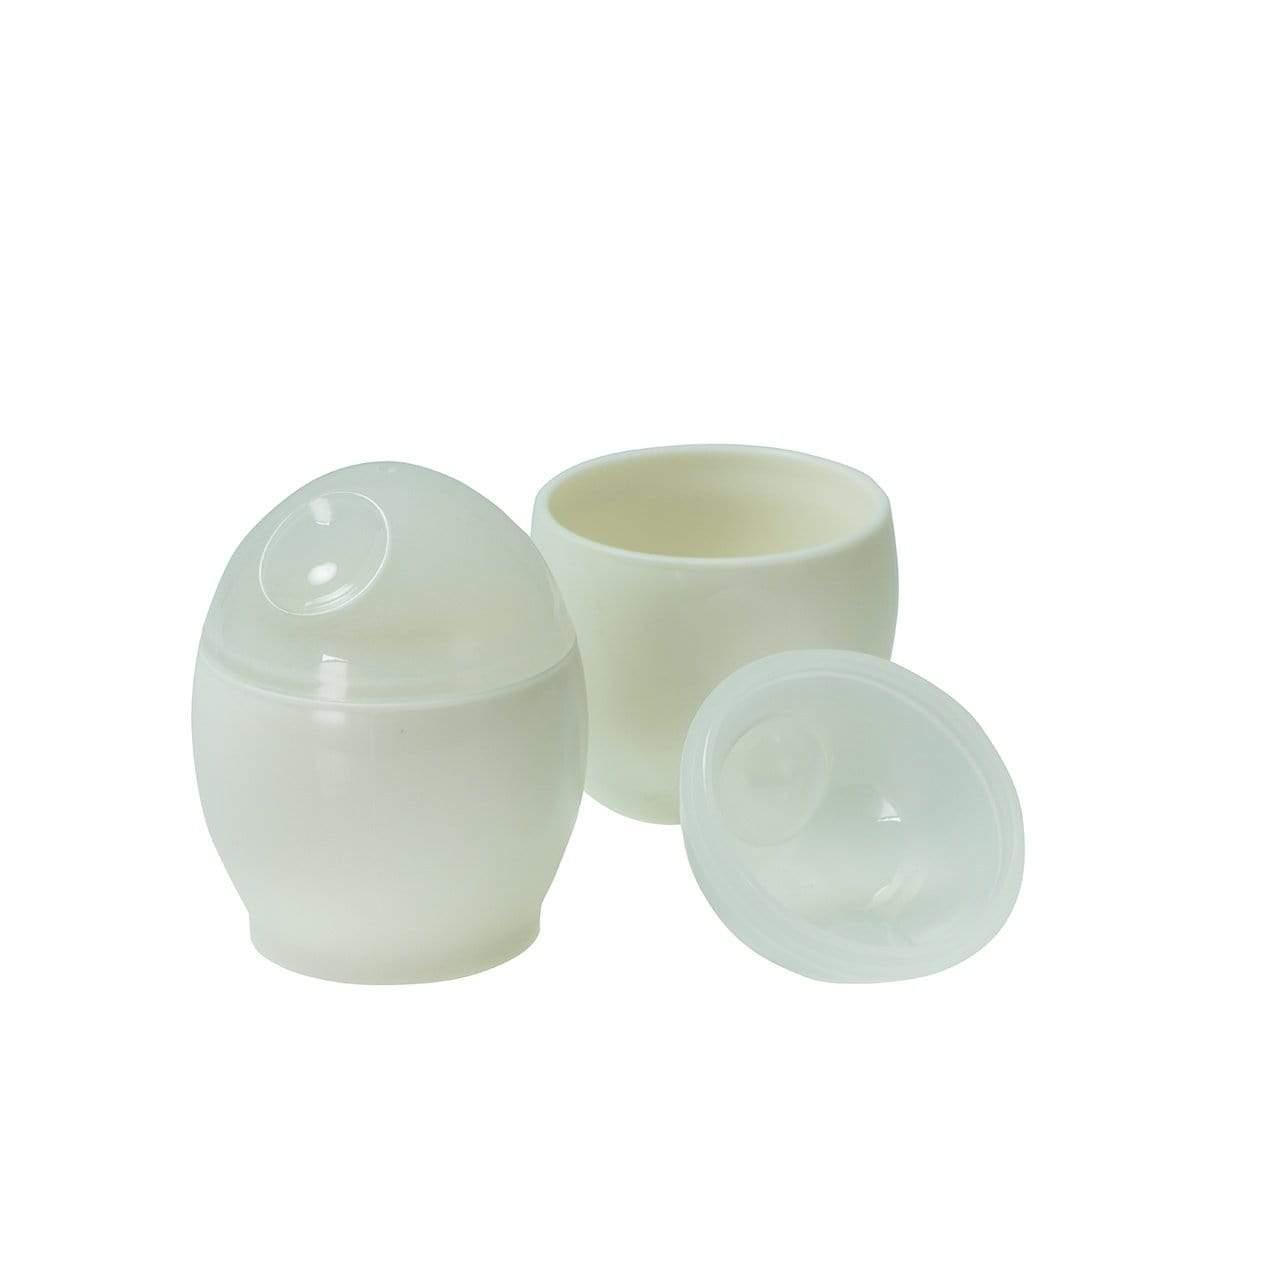 Avanti Microwave Egg Poachers Set of 2